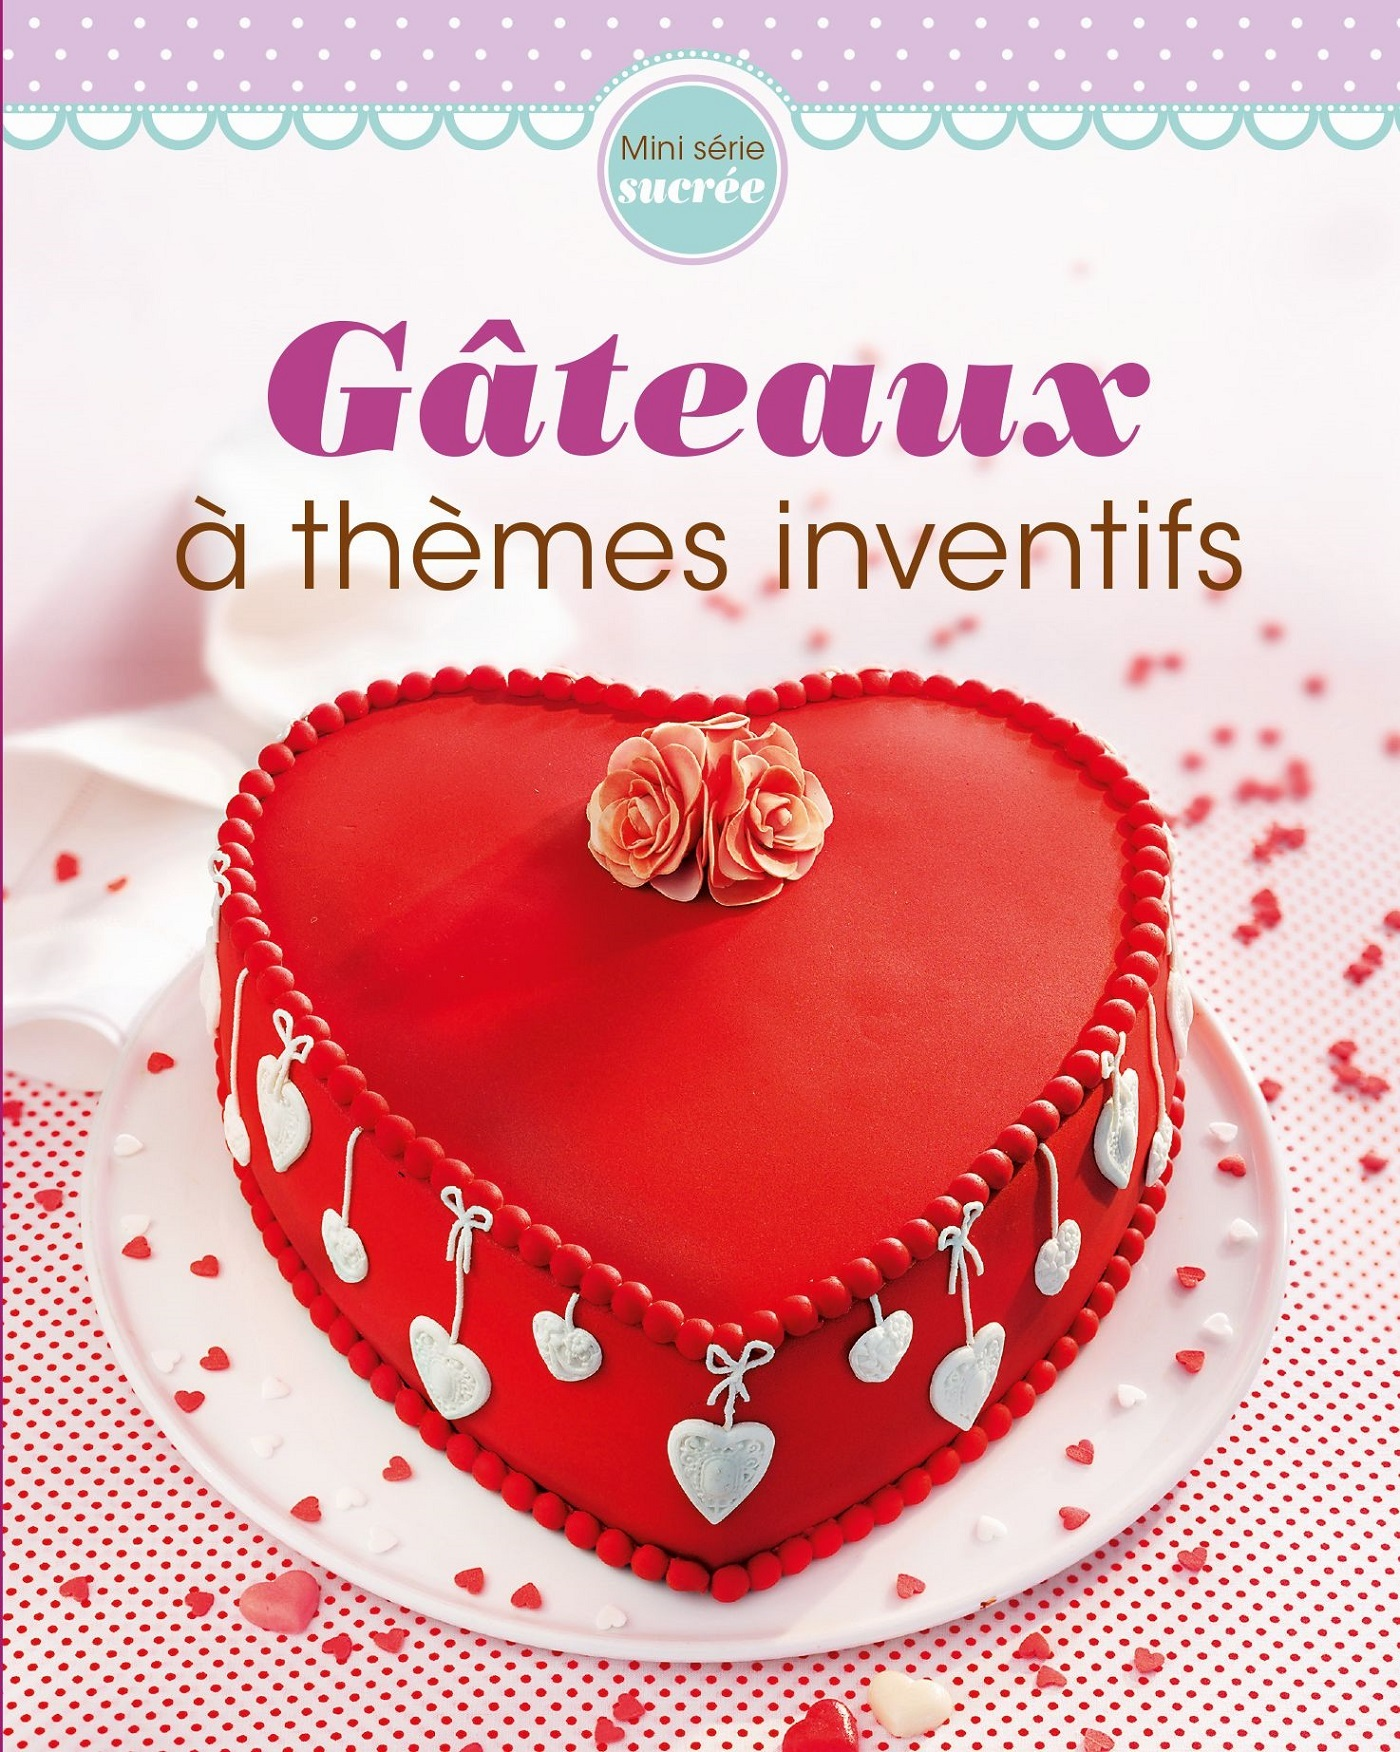 GATEAUX A THEMES INVENTIFS